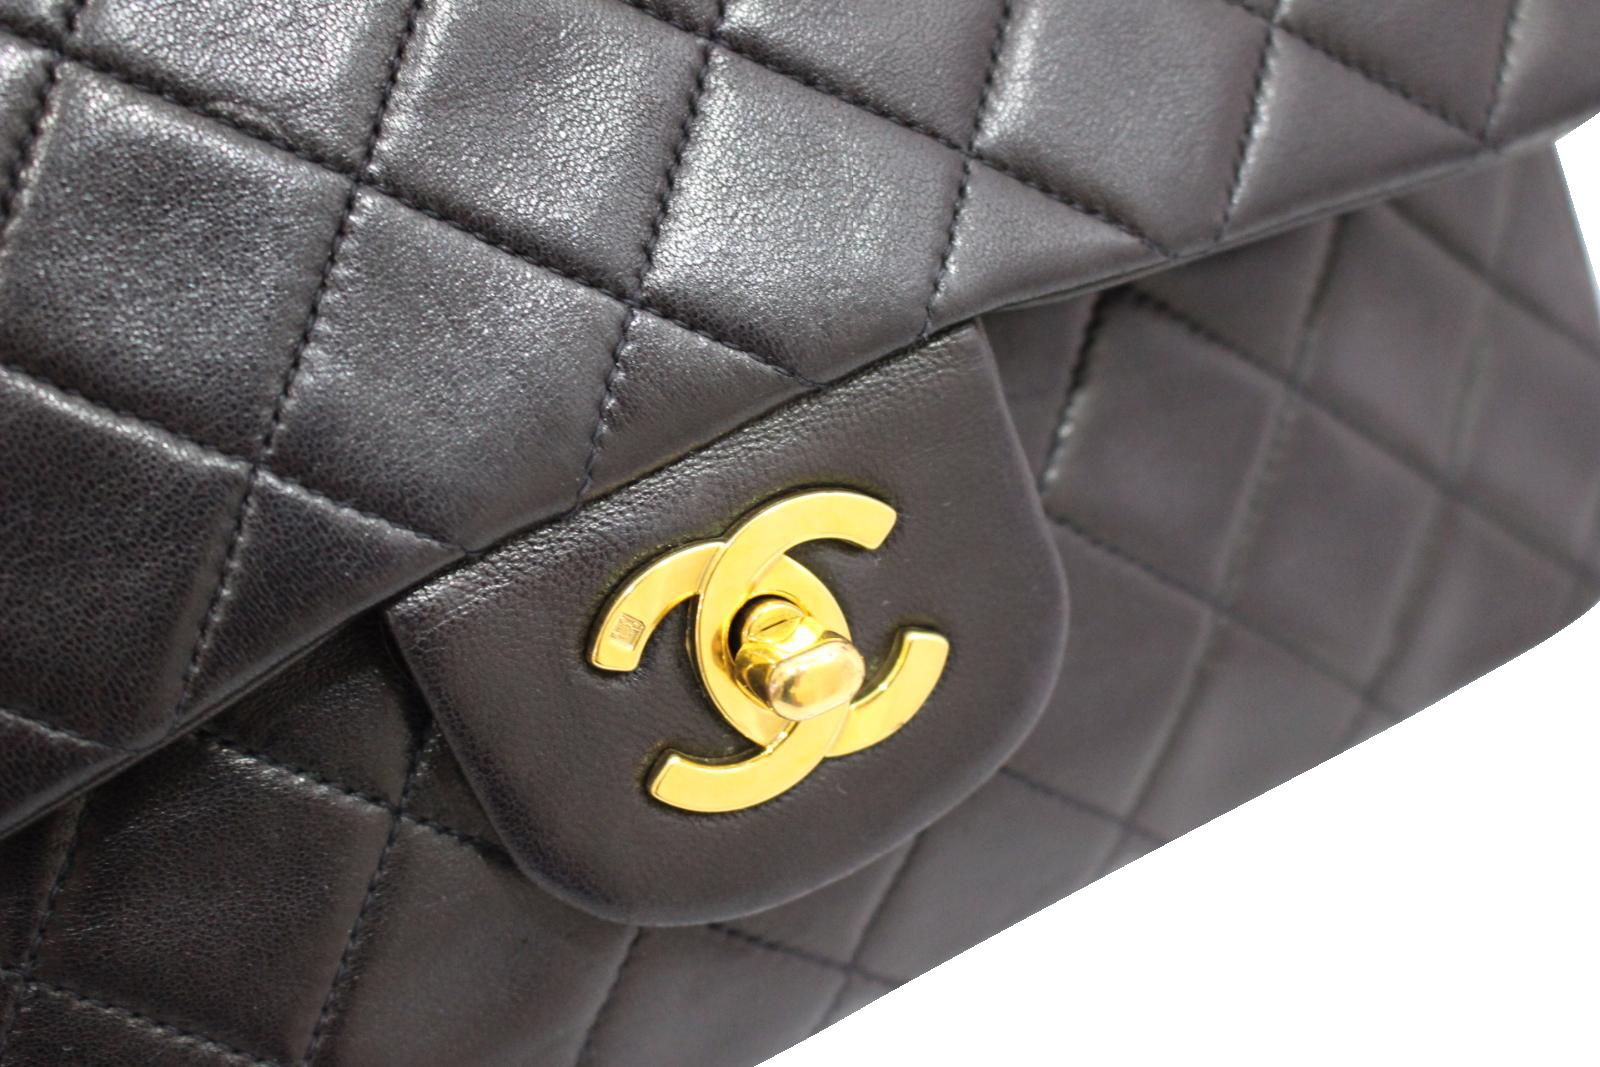 Sac Chanel Timeless 25